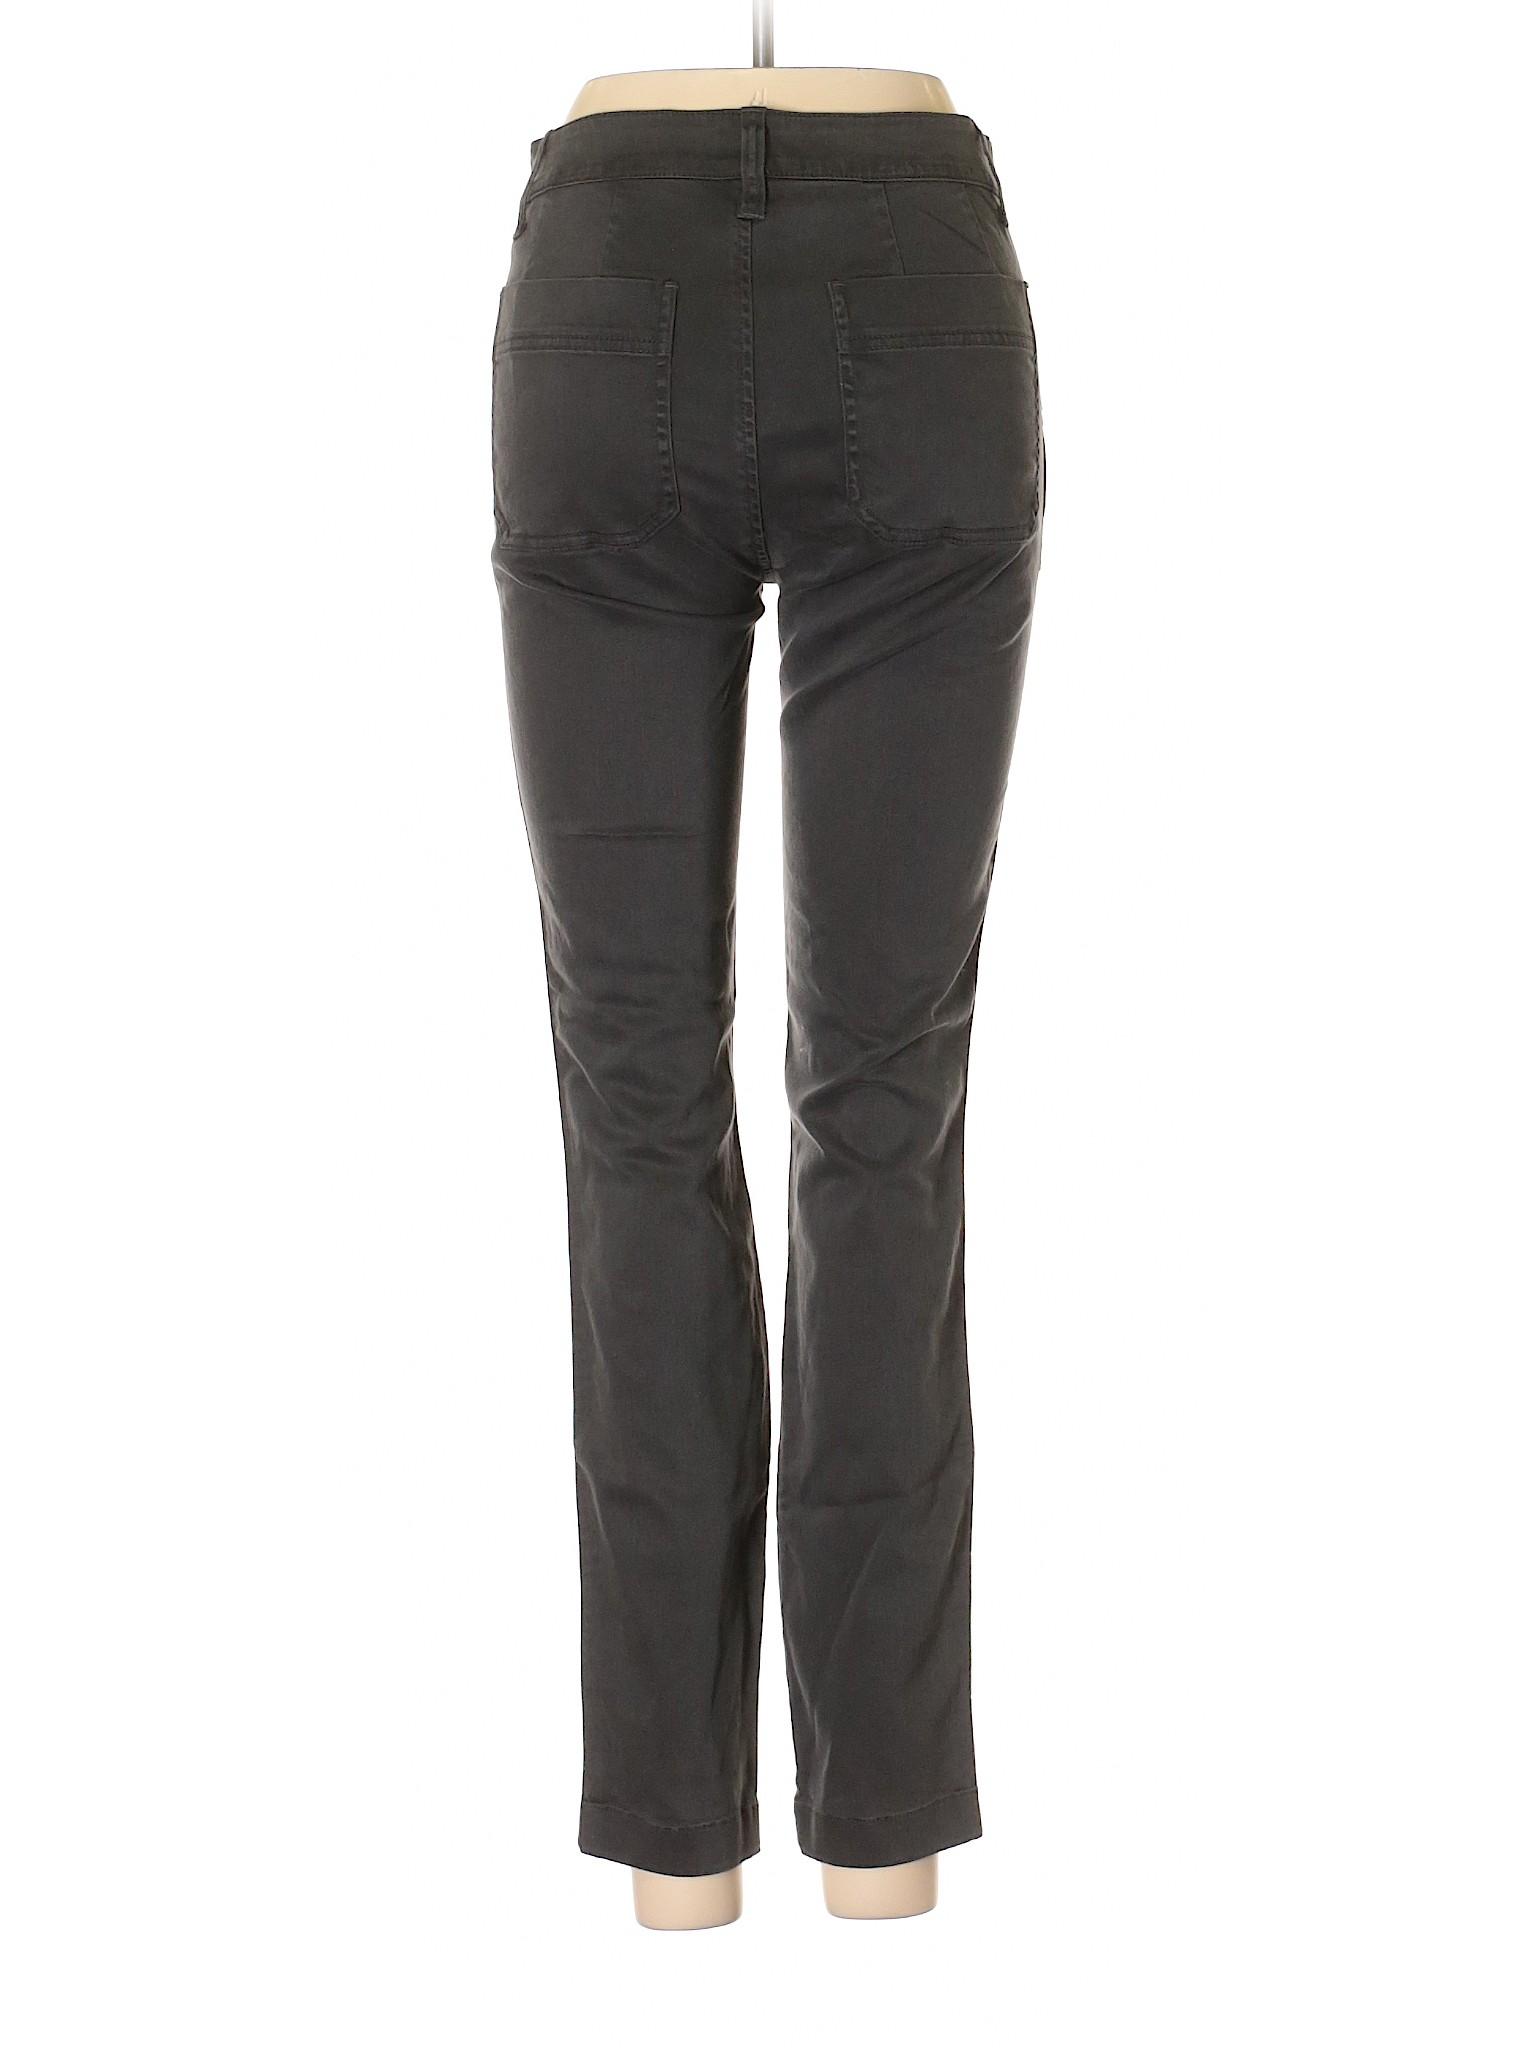 Pants Boutique J winter Crew Casual nIpnx